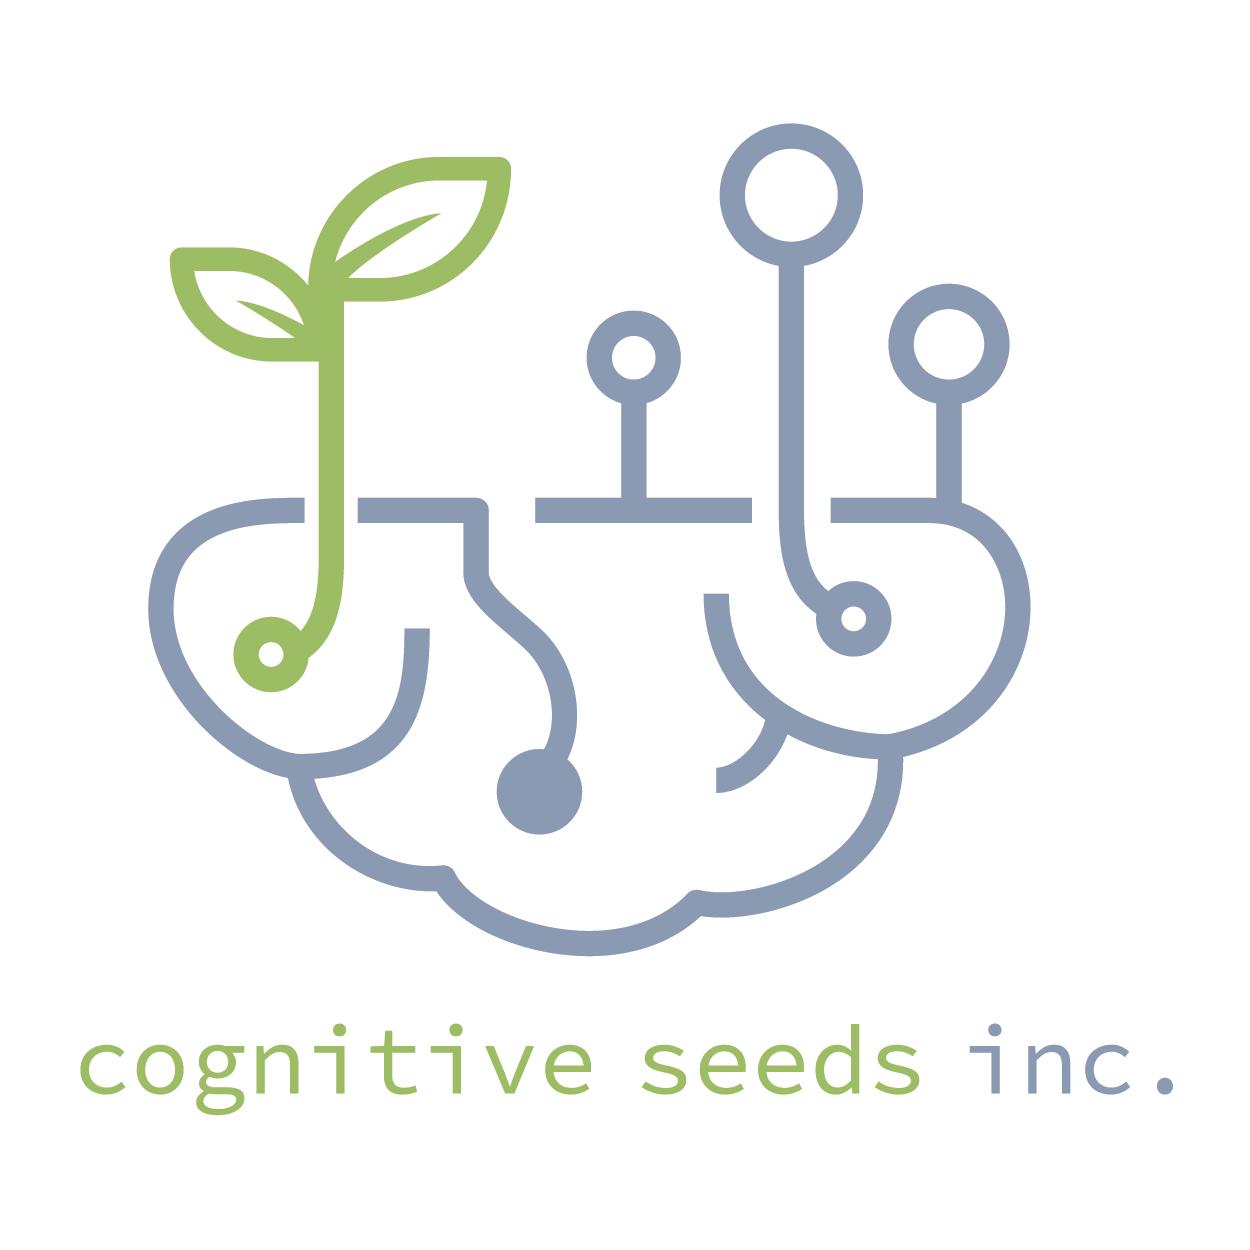 Cognitive Seeds